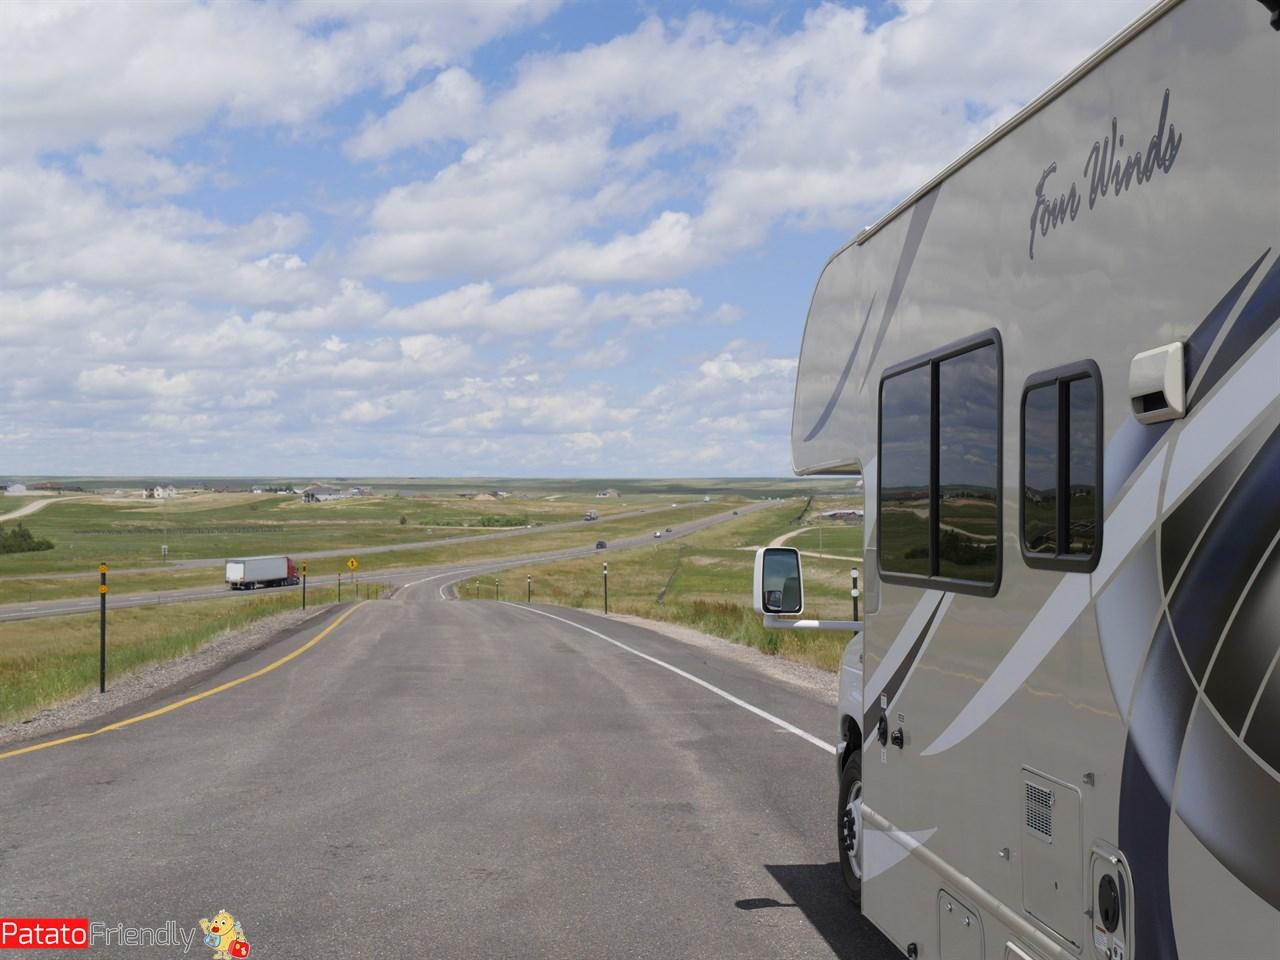 [cml_media_alt id='12424']Stati Uniti in camper a Fort Laramie[/cml_media_alt]